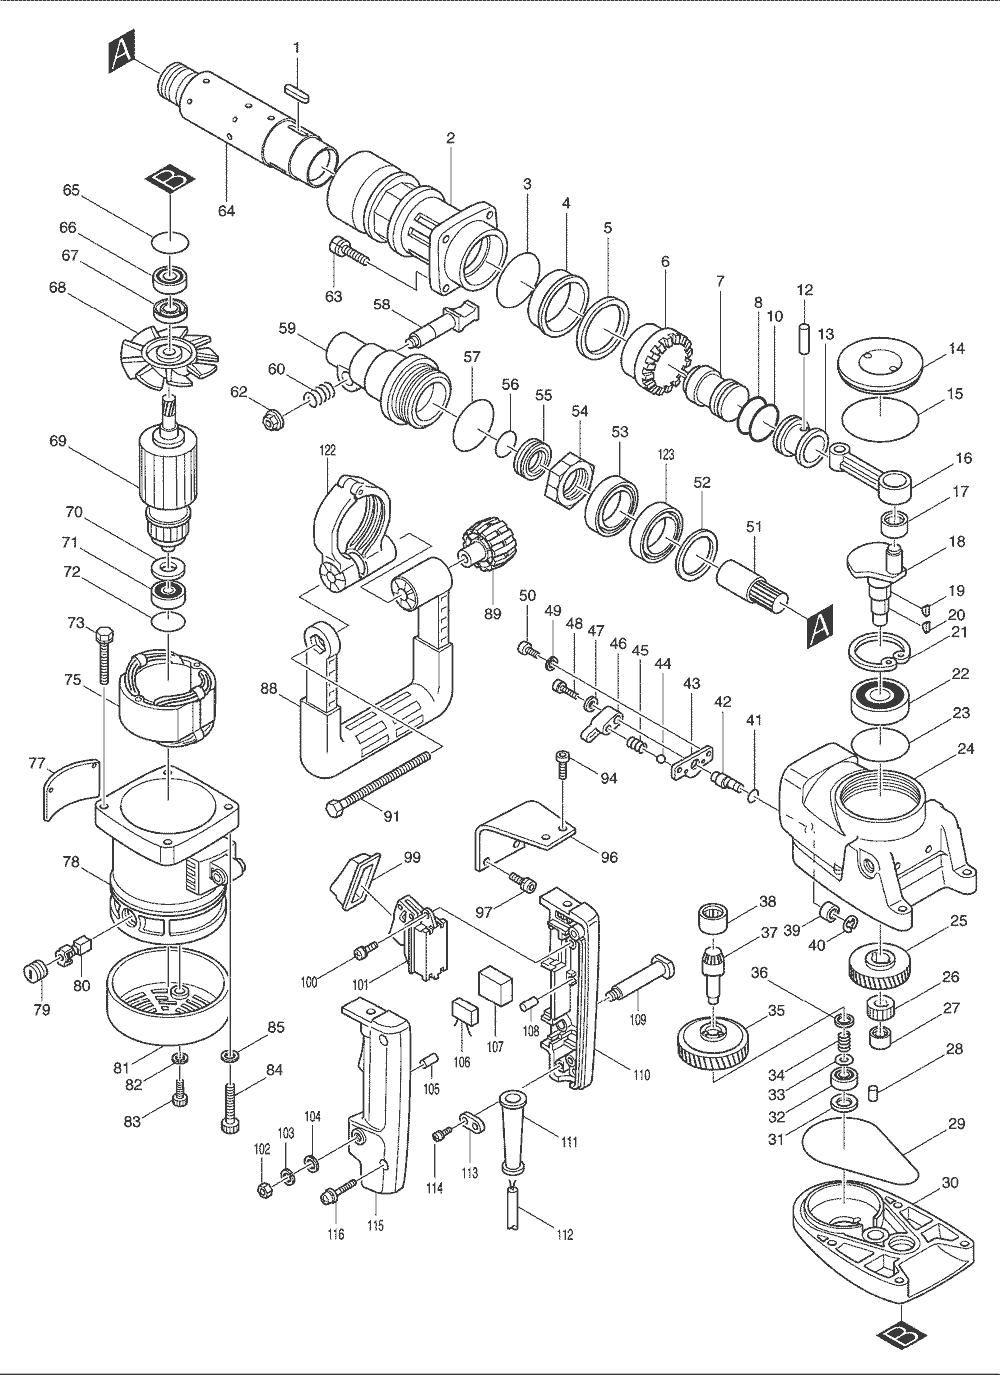 Buy Makita HR5000 2 Inch Spline Shank, AC/DC Replacement